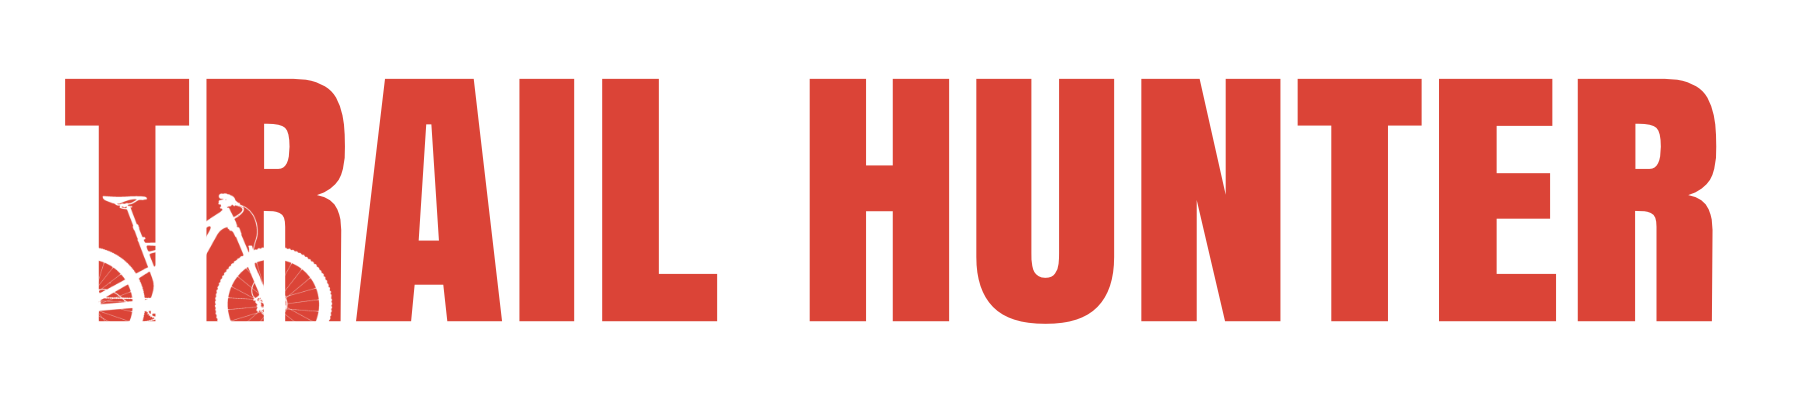 Trail Hunter - logo WEB